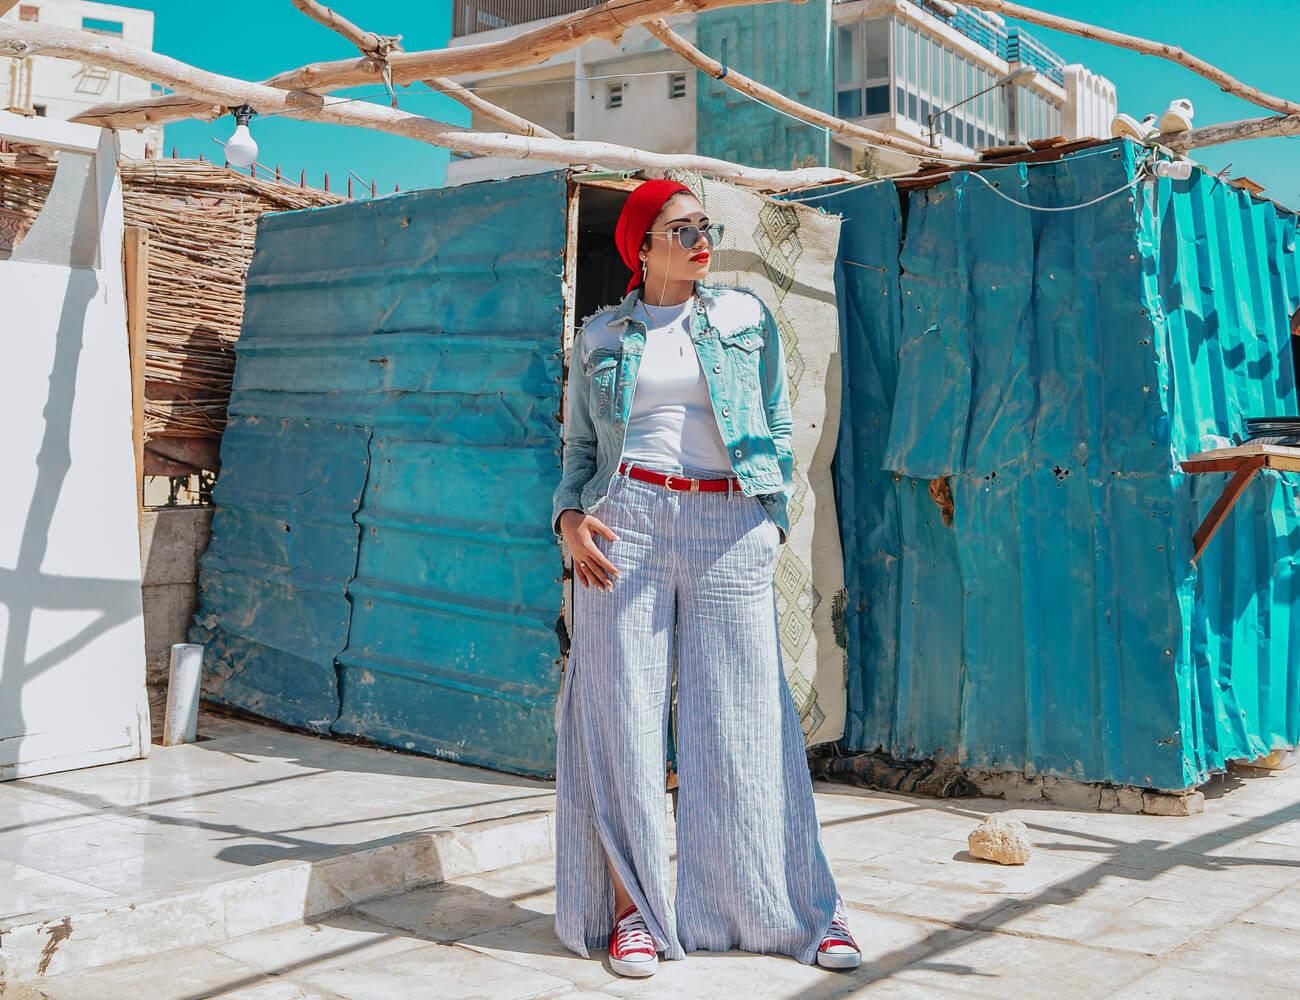 Street Fashion Session